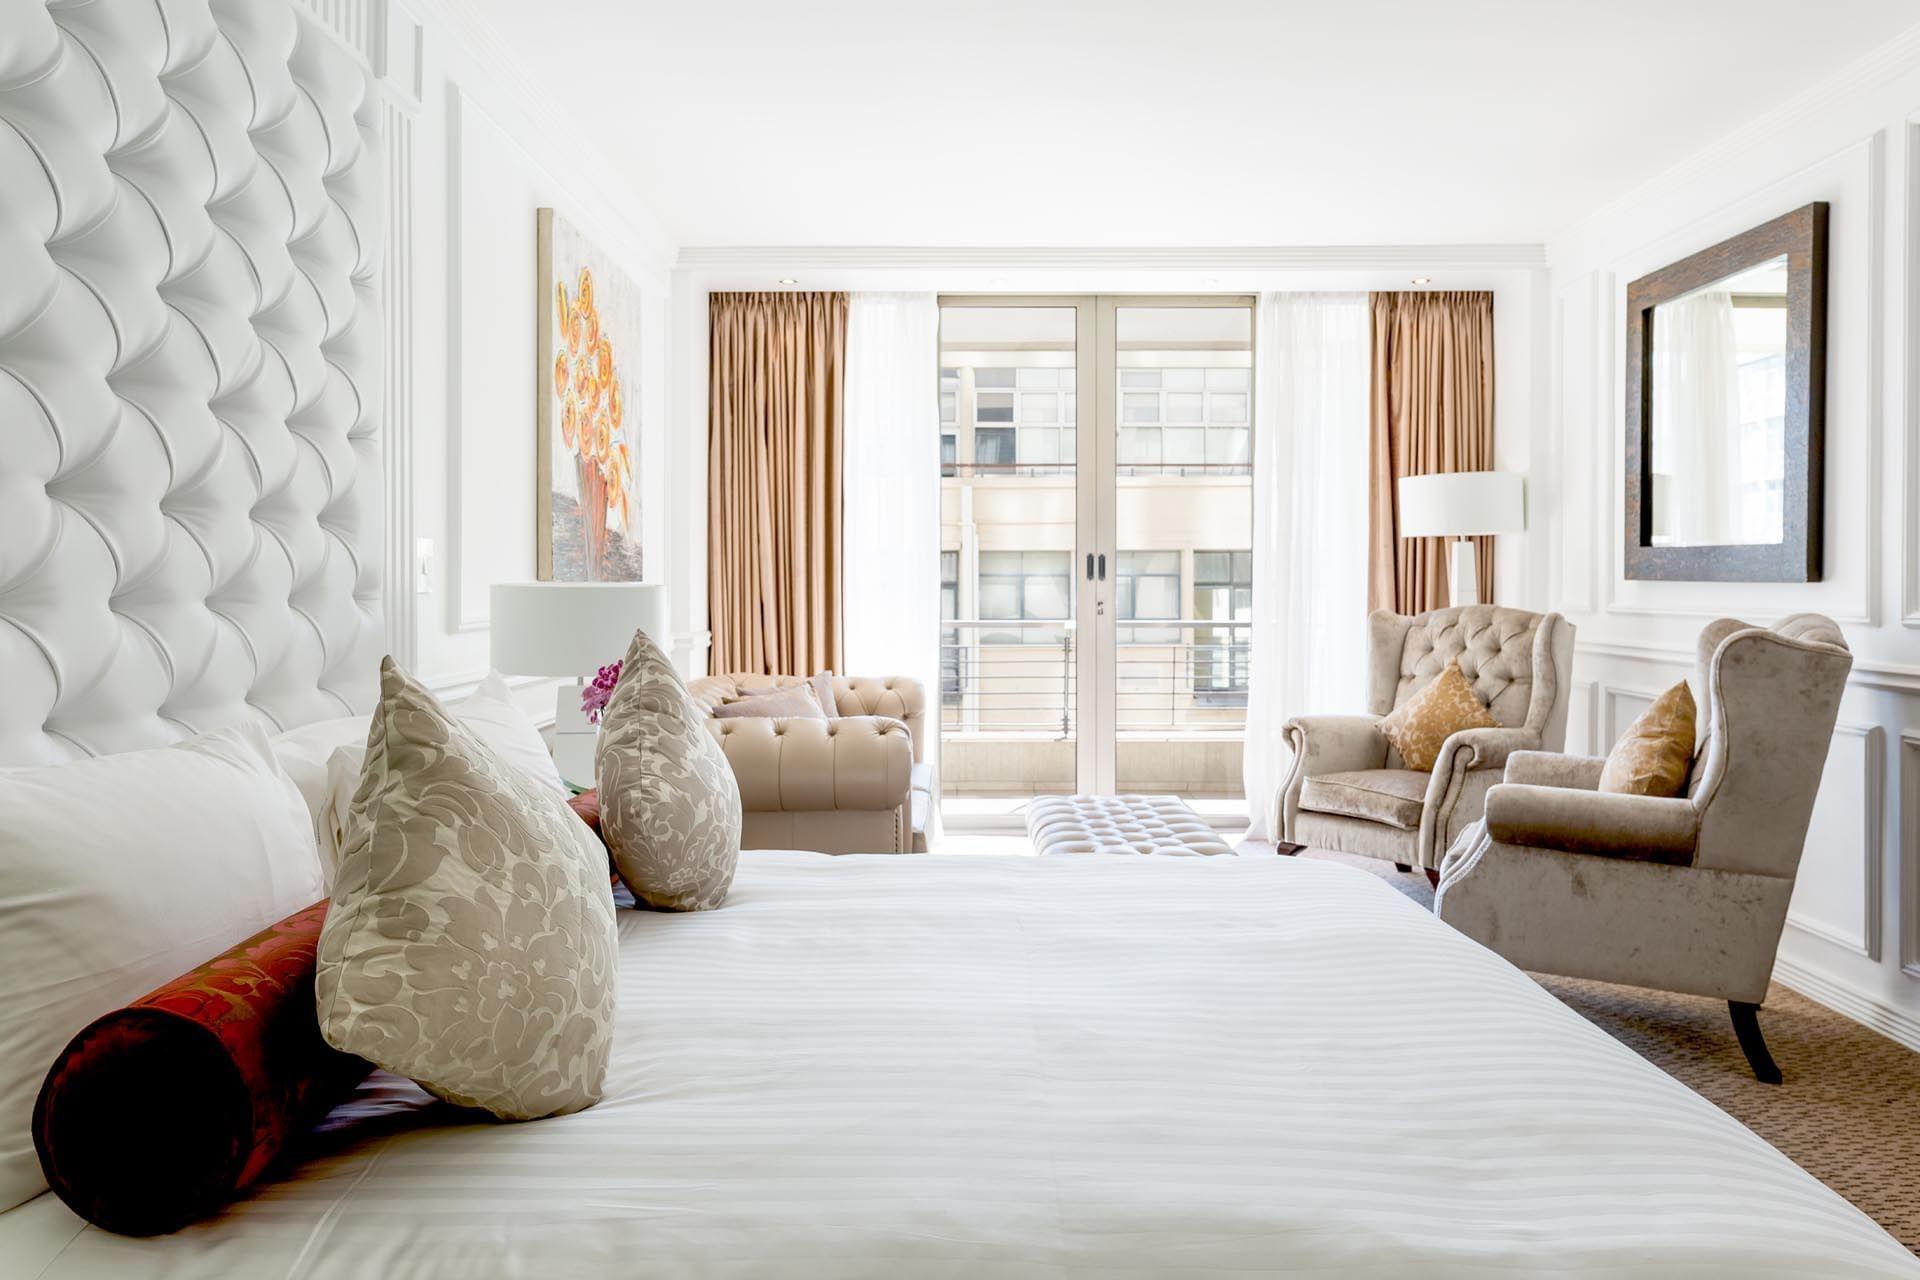 bedroom at Pepperclub Hotel